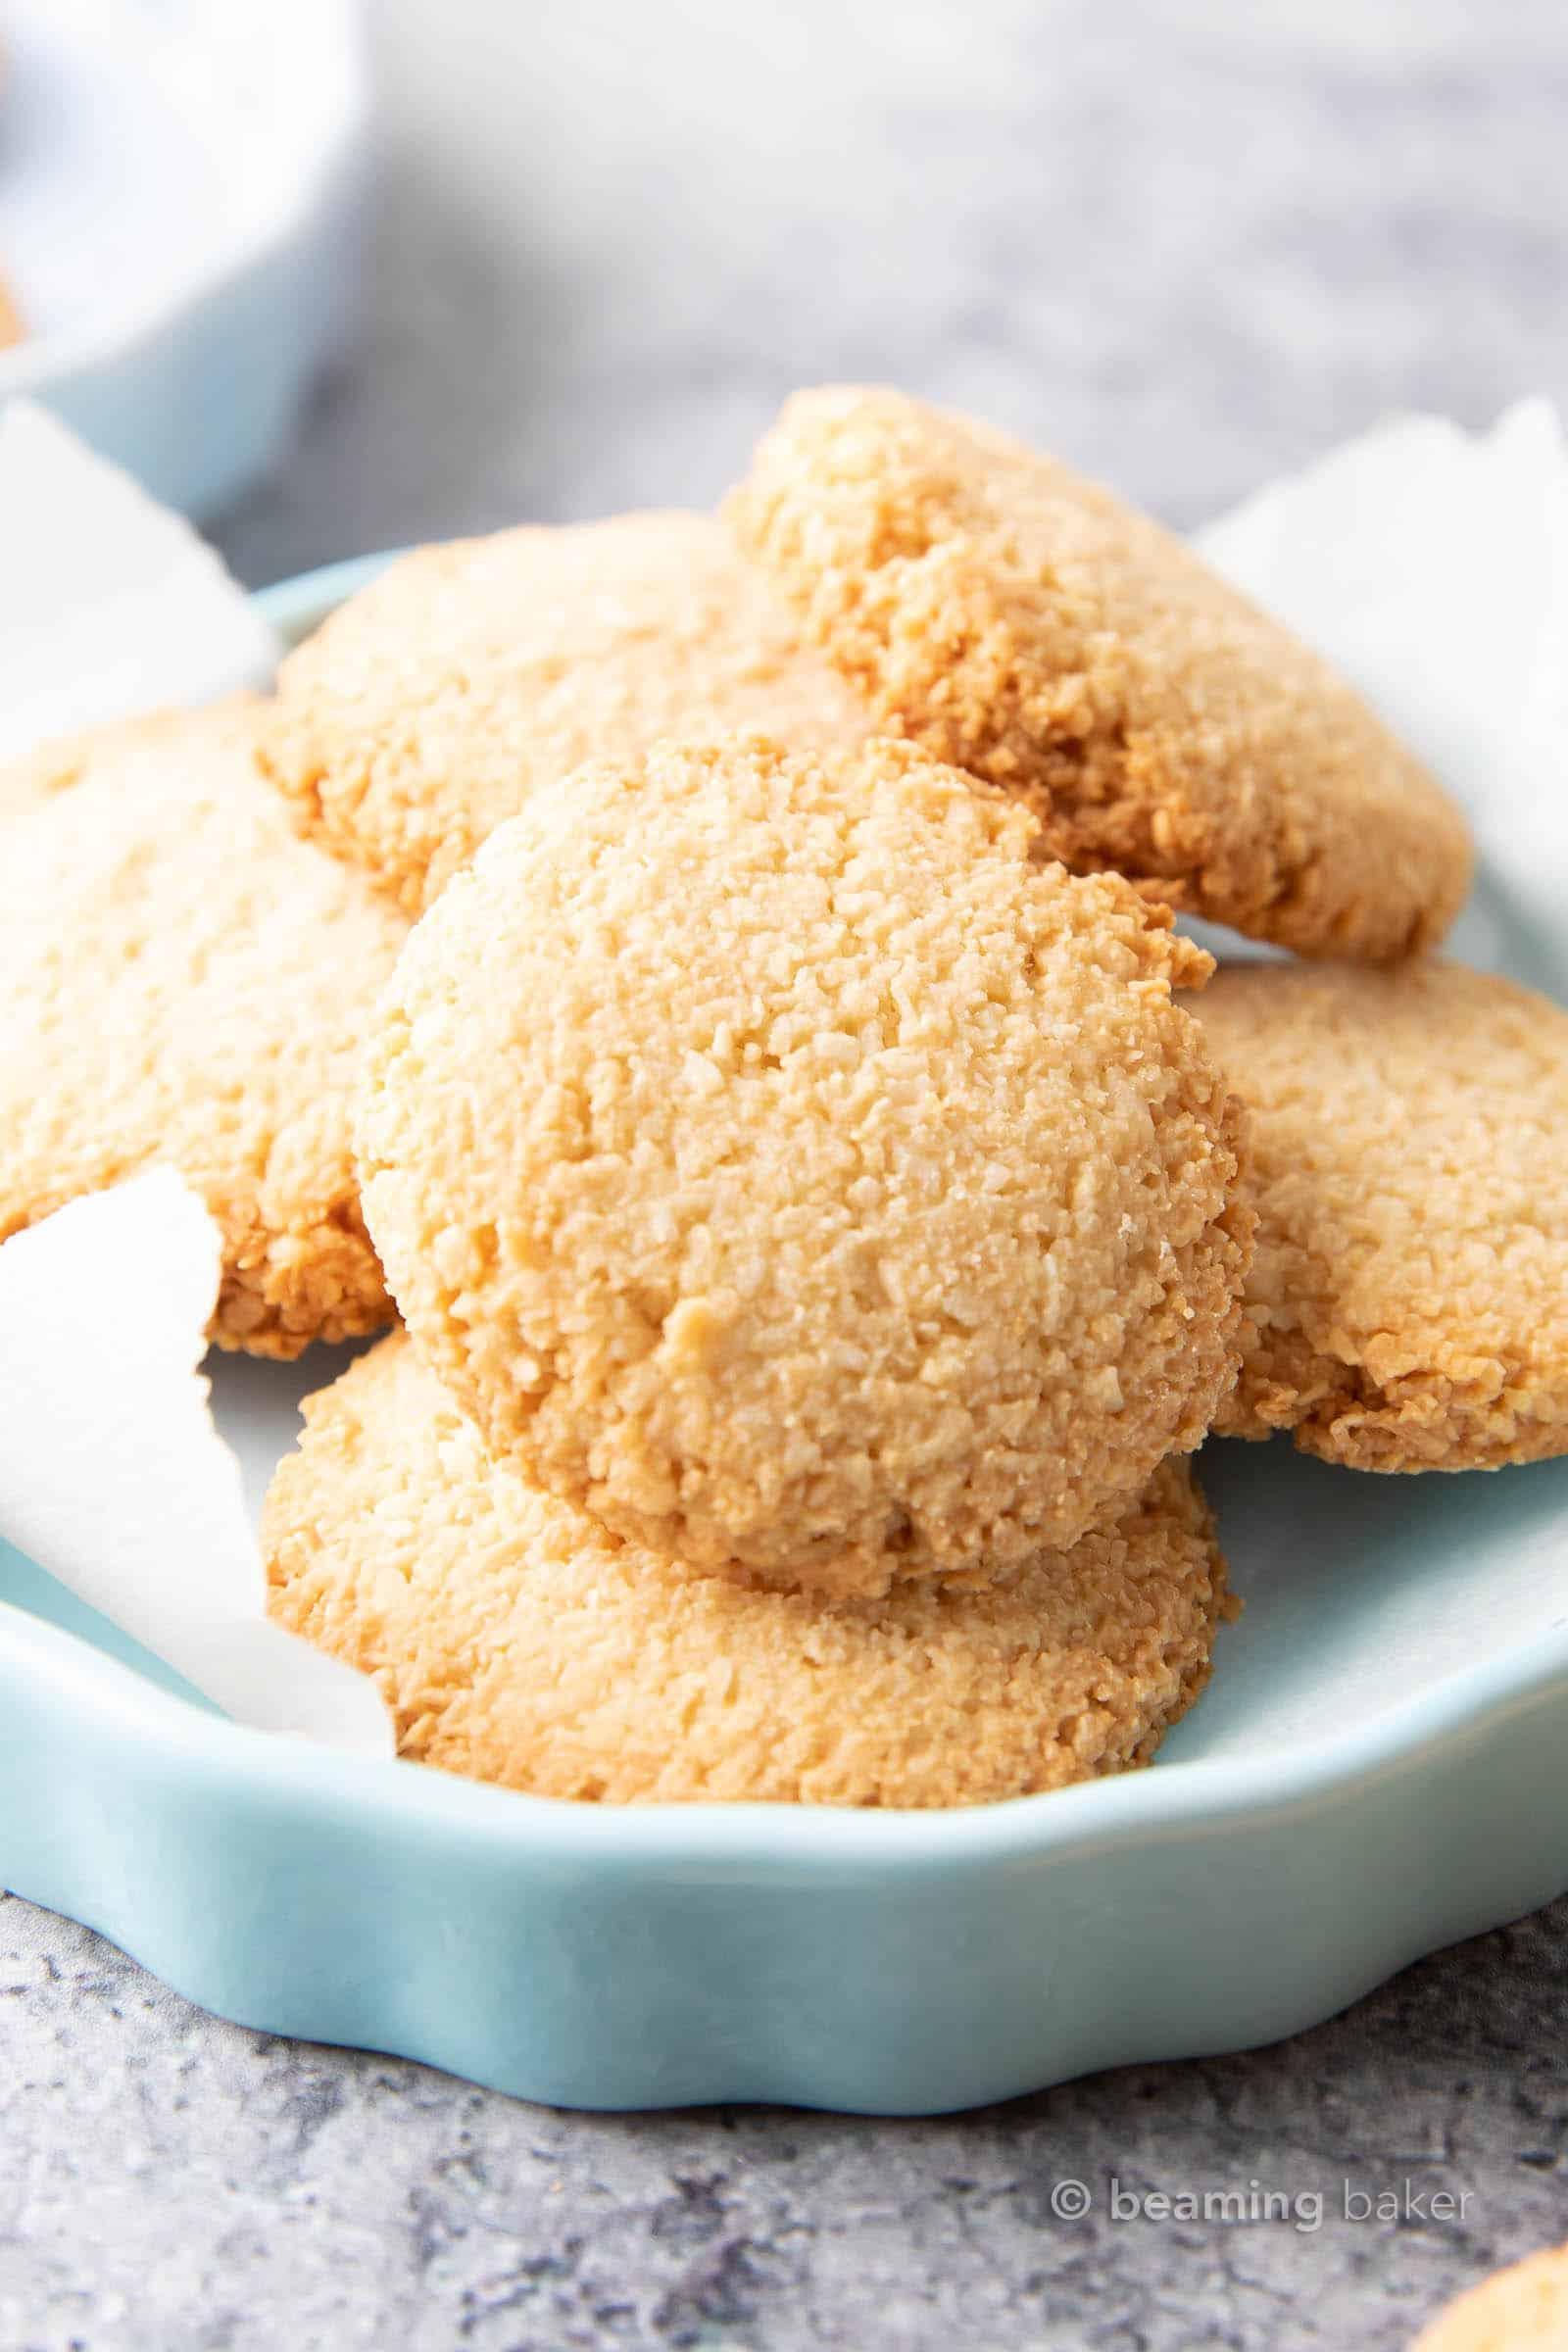 Vegan Coconut Cookies: an easy 4 ingredient recipe for crunchy, crispy vegan cookies packed with three kinds of coconut! #Vegan #Cookies #Coconut #VeganCookies   Recipe at BeamingBaker.com